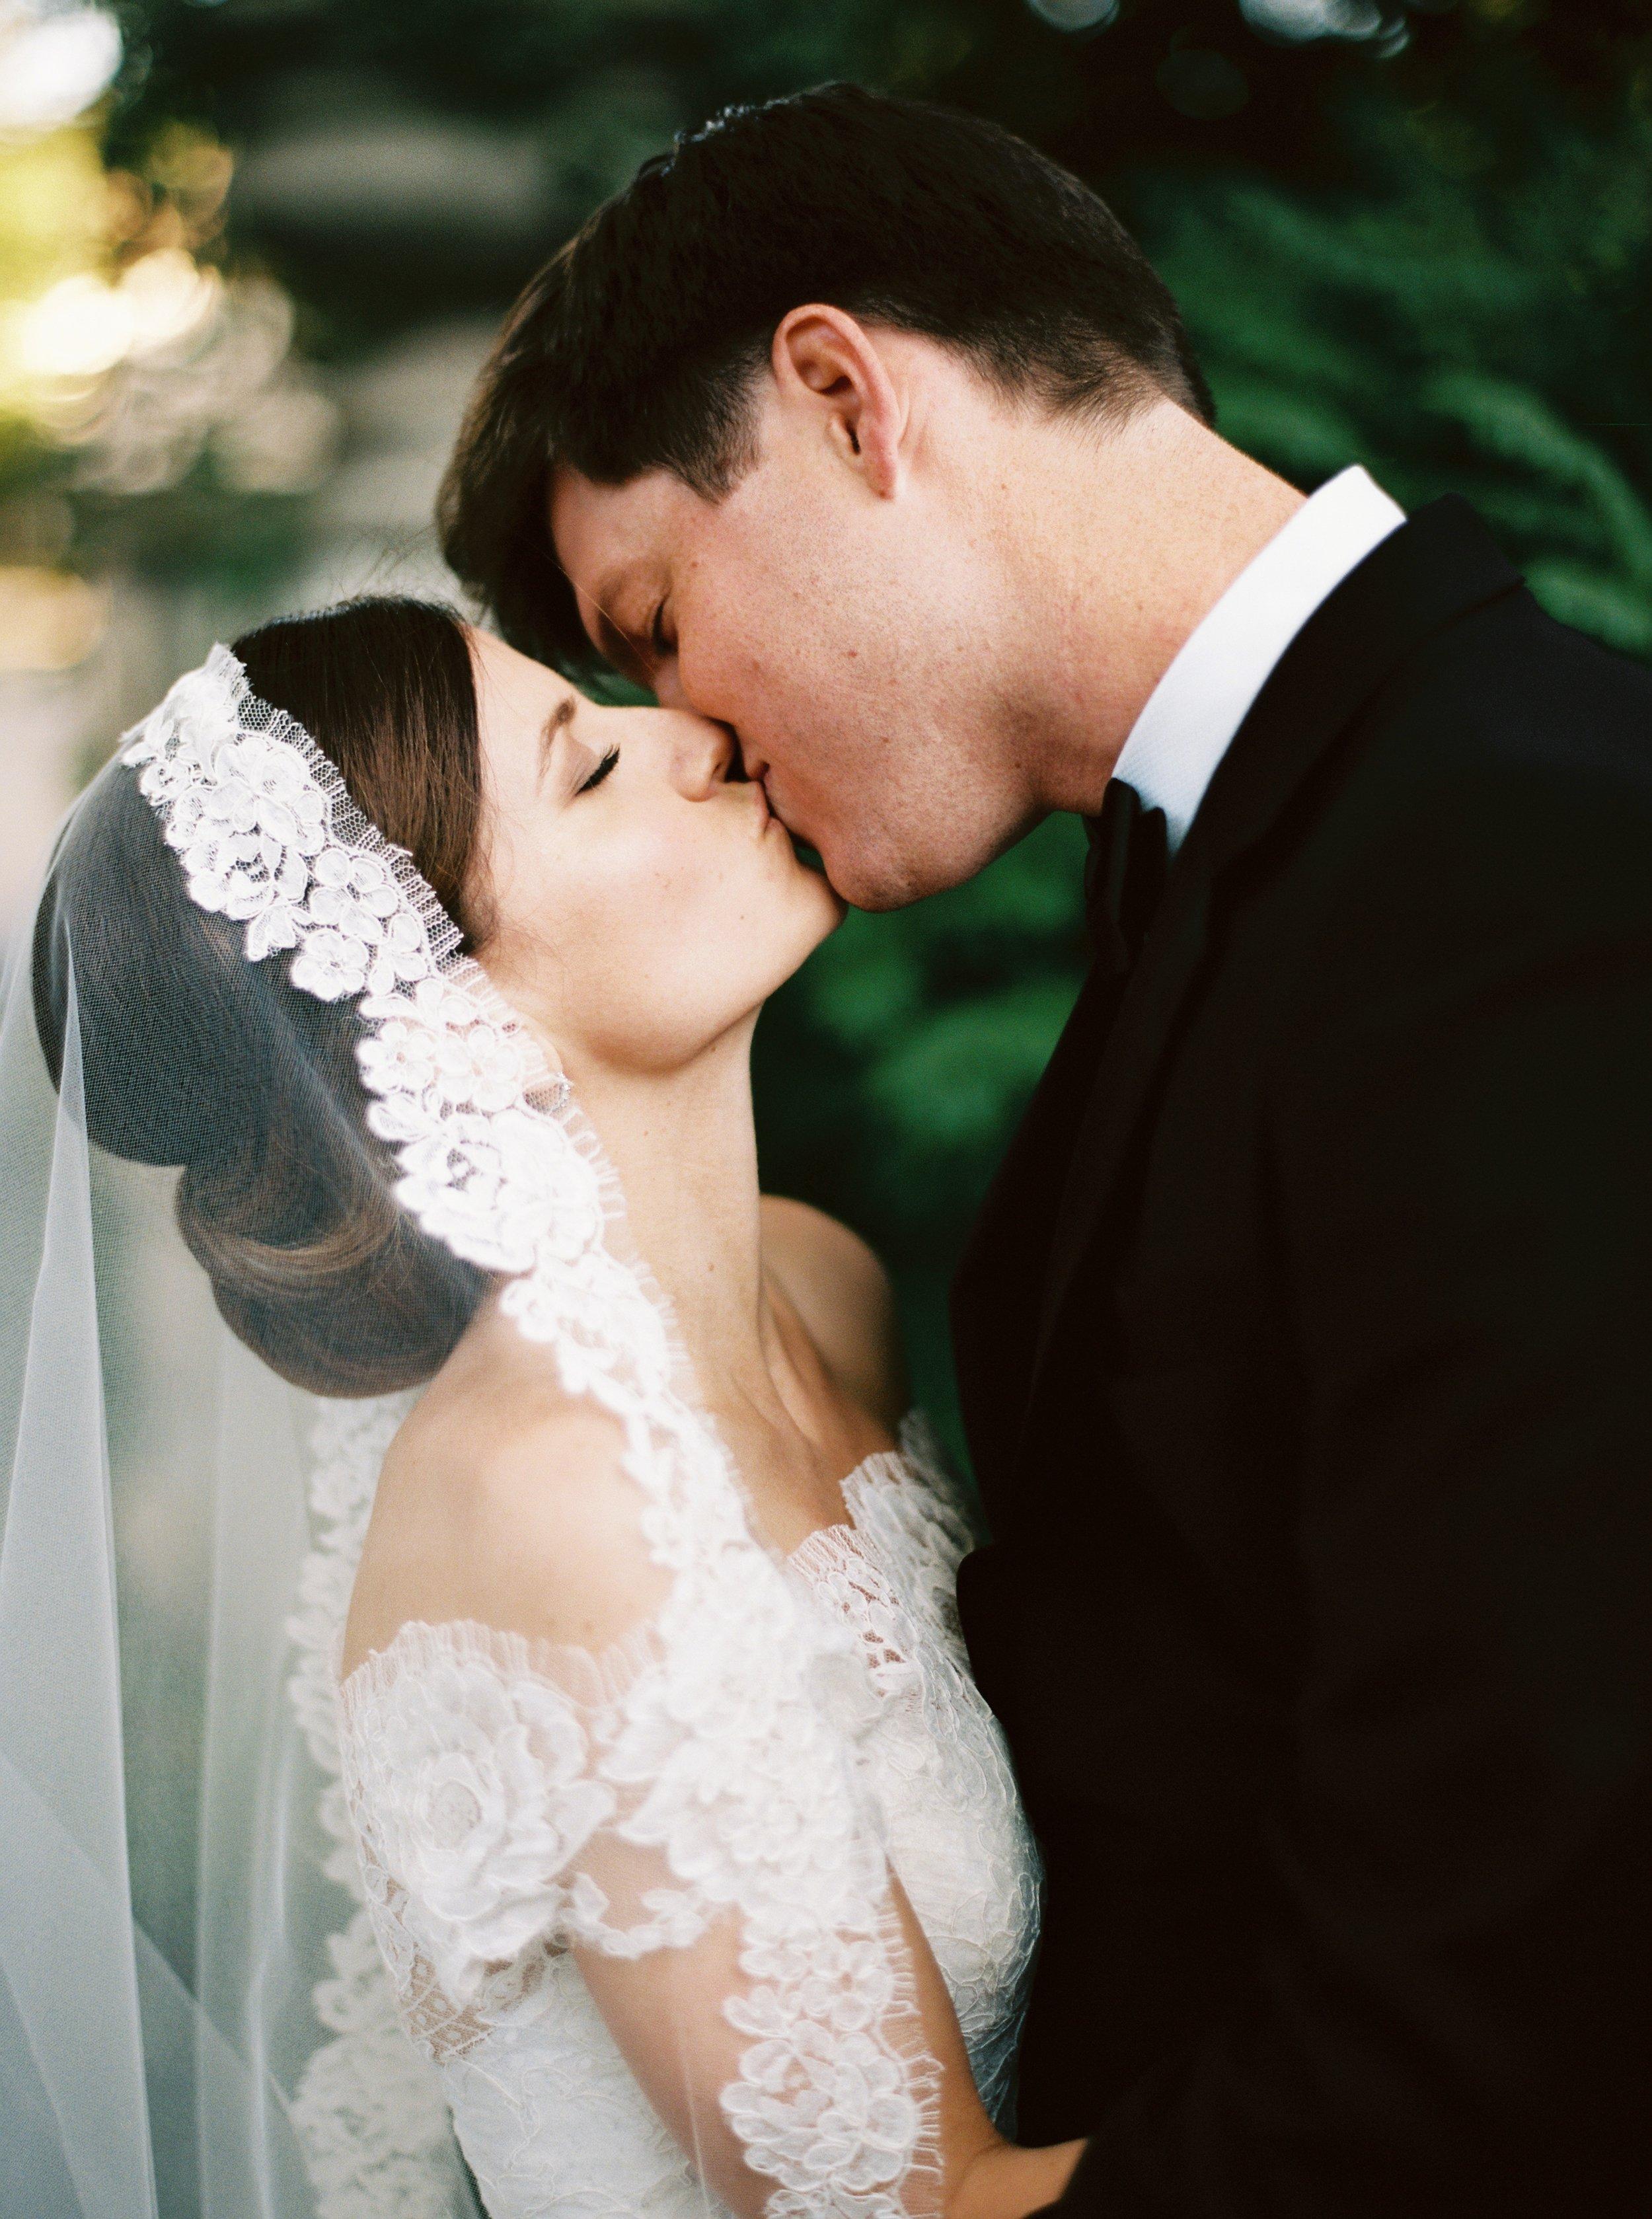 Kyle John l Fine Art Wedding Photography l Chicago, Copenhagen, California, New York, Destination l Blog l Connie & Connor_Winnetka_26